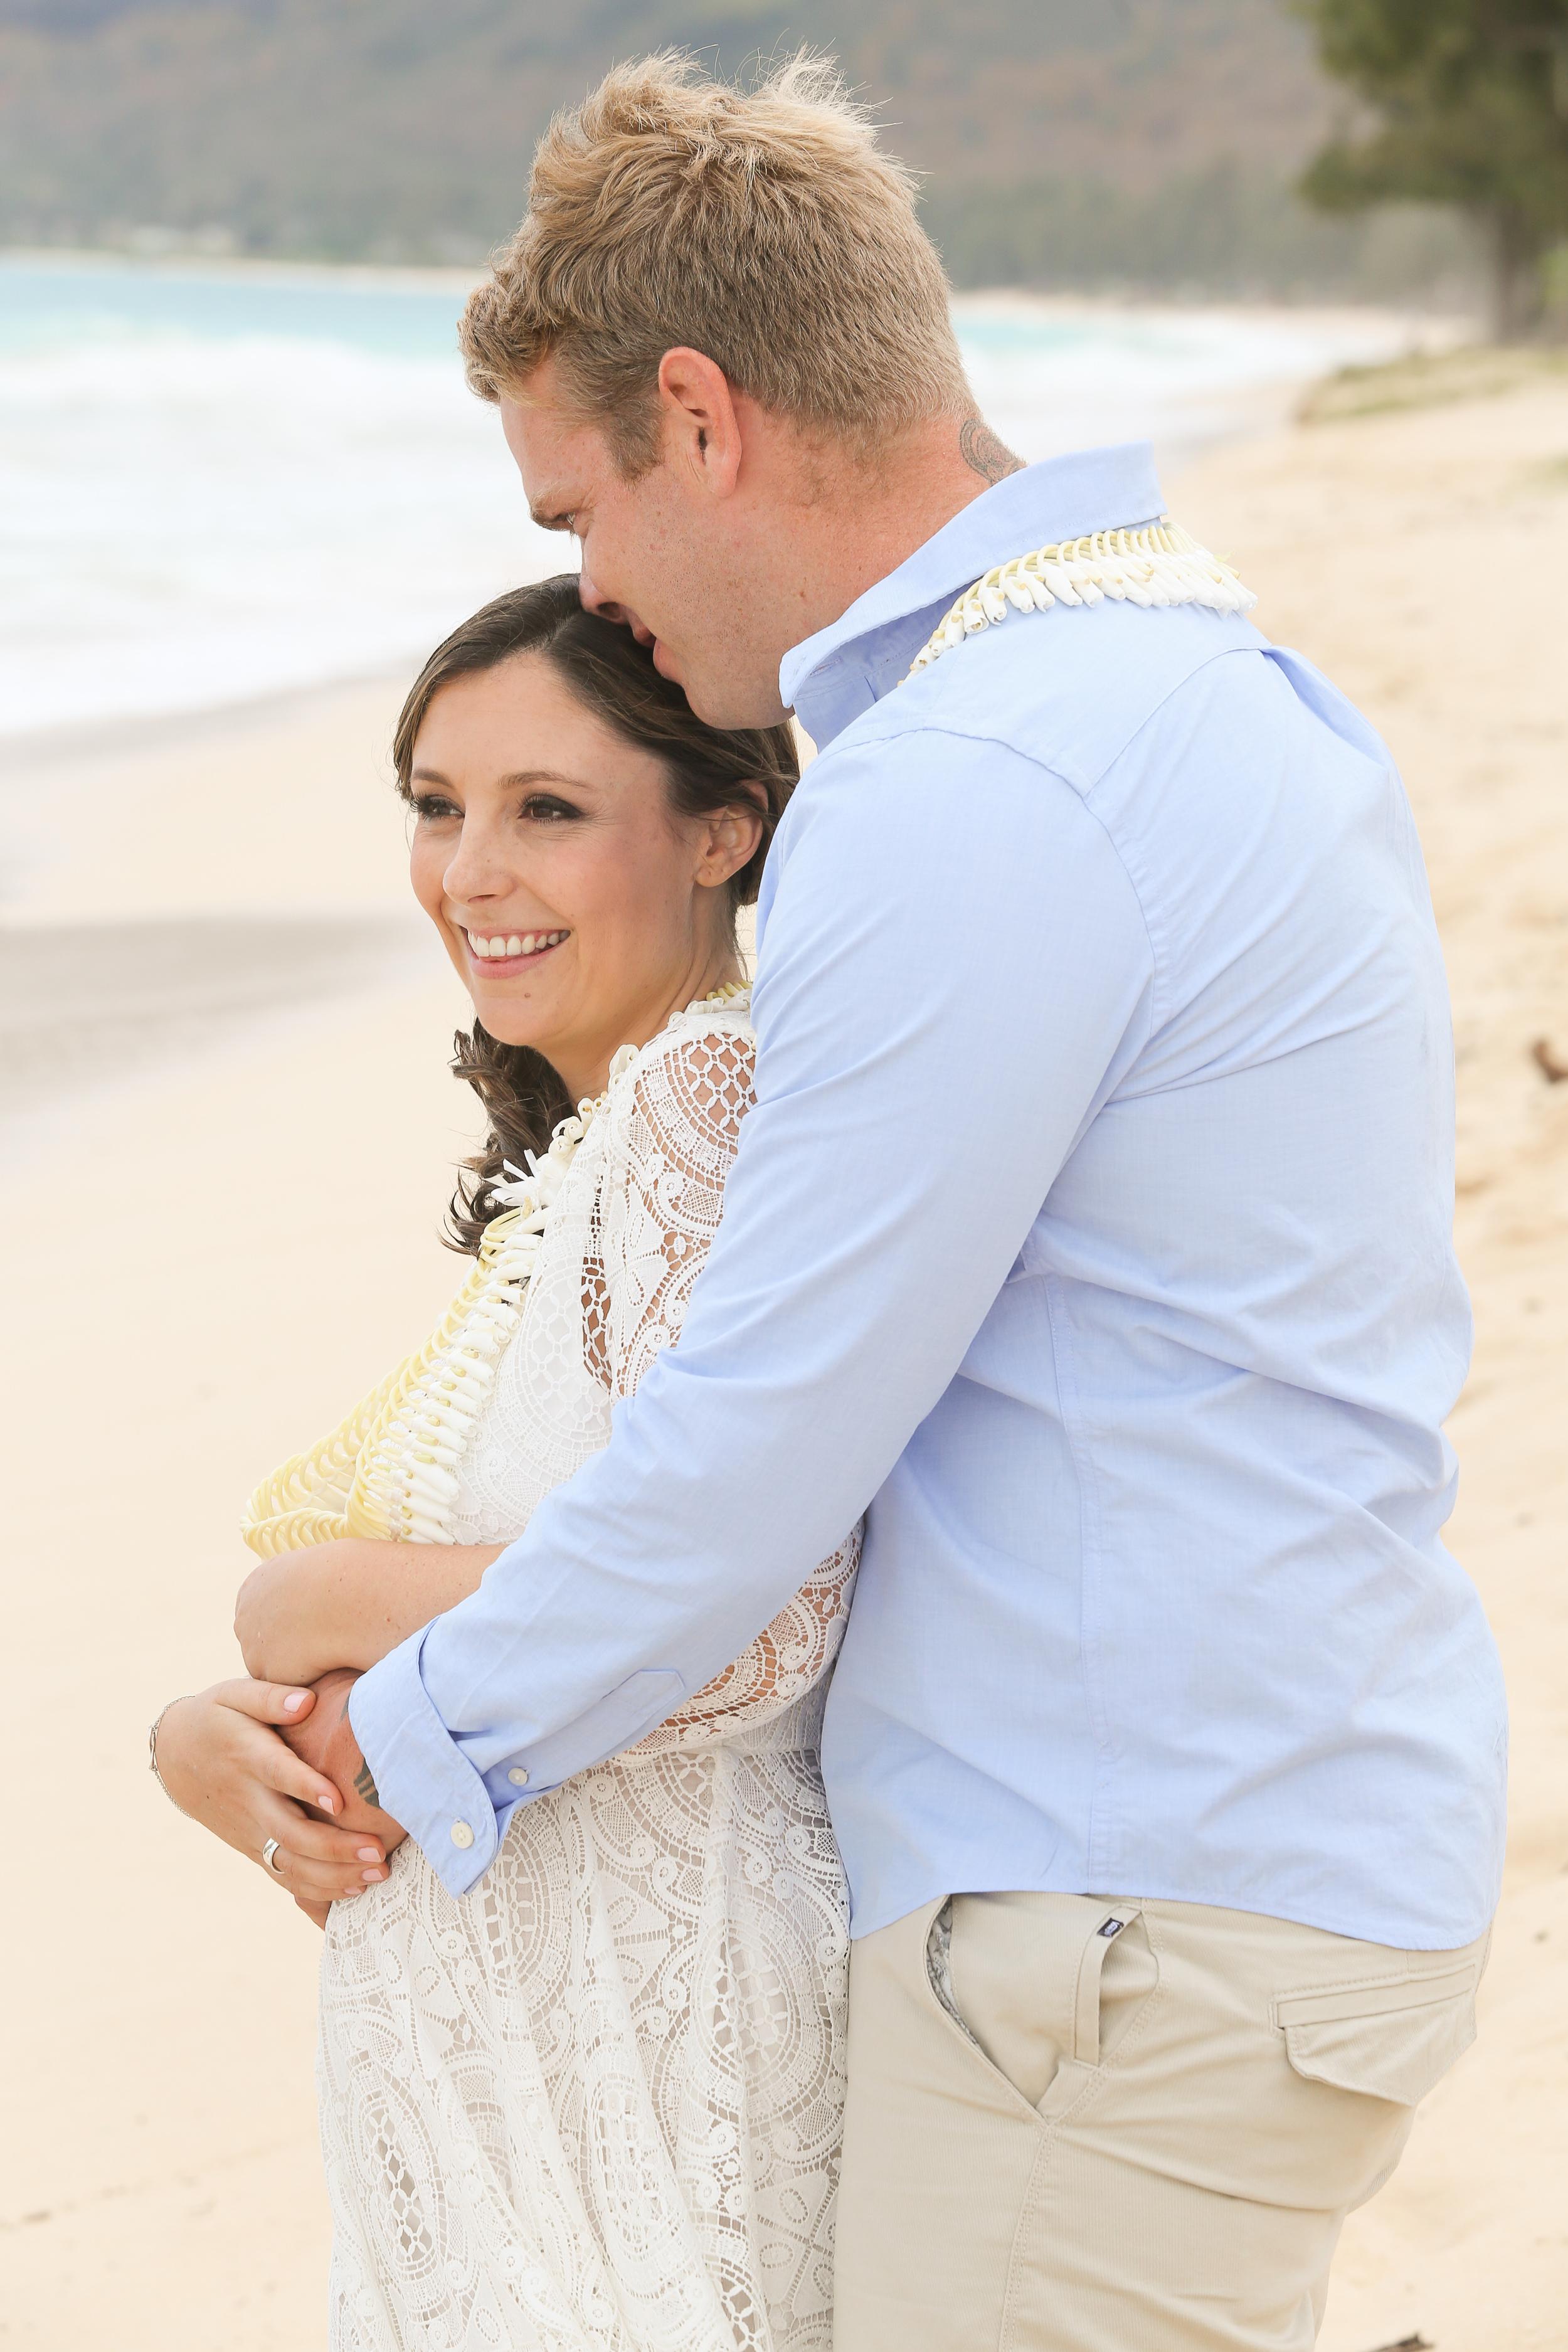 Tracey and Evan Wedding 2015_010.JPG